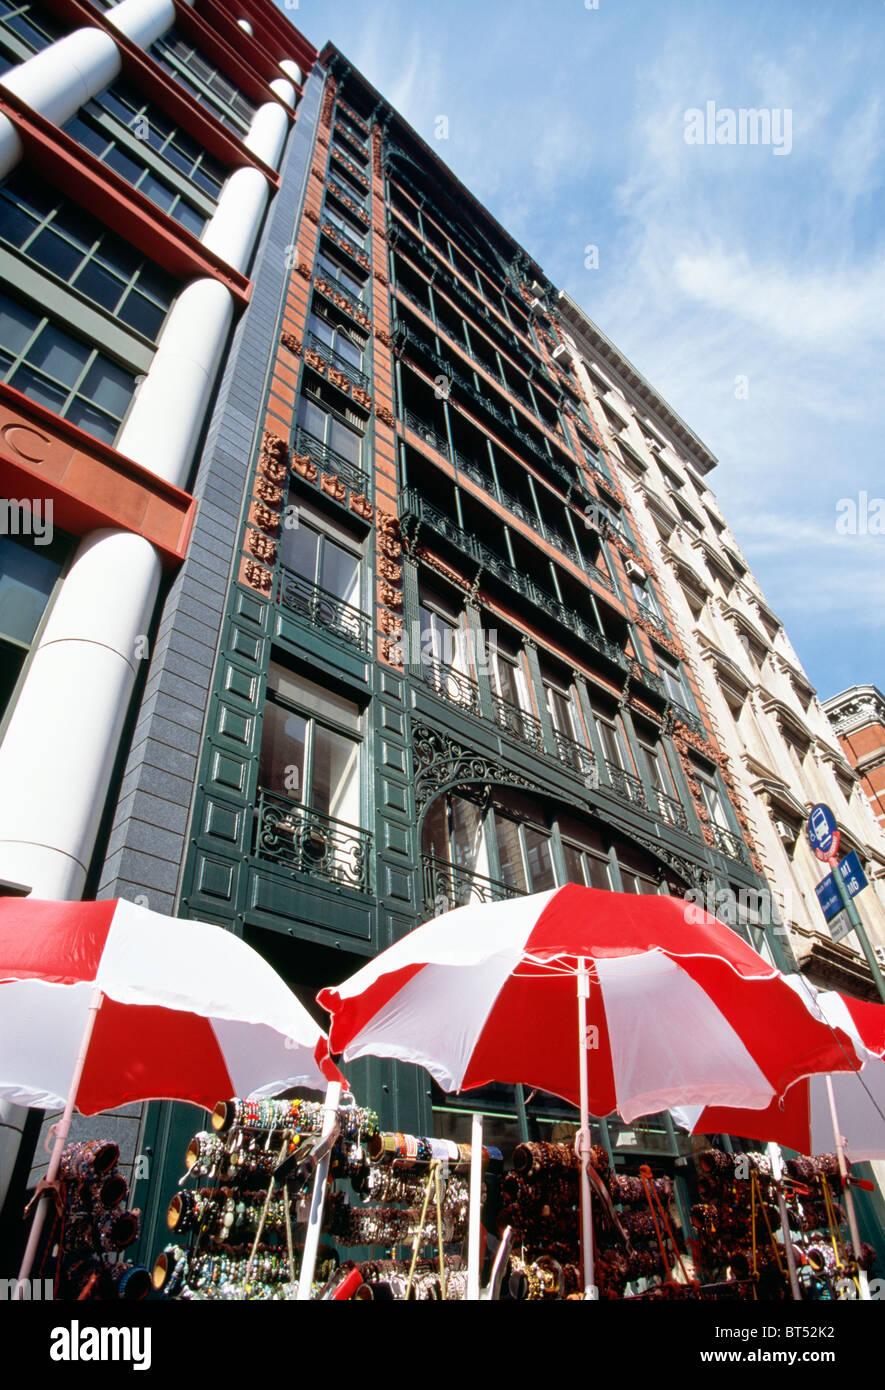 Sidewalk Vendors and Building Facades, SoHo, NYC - Stock Image